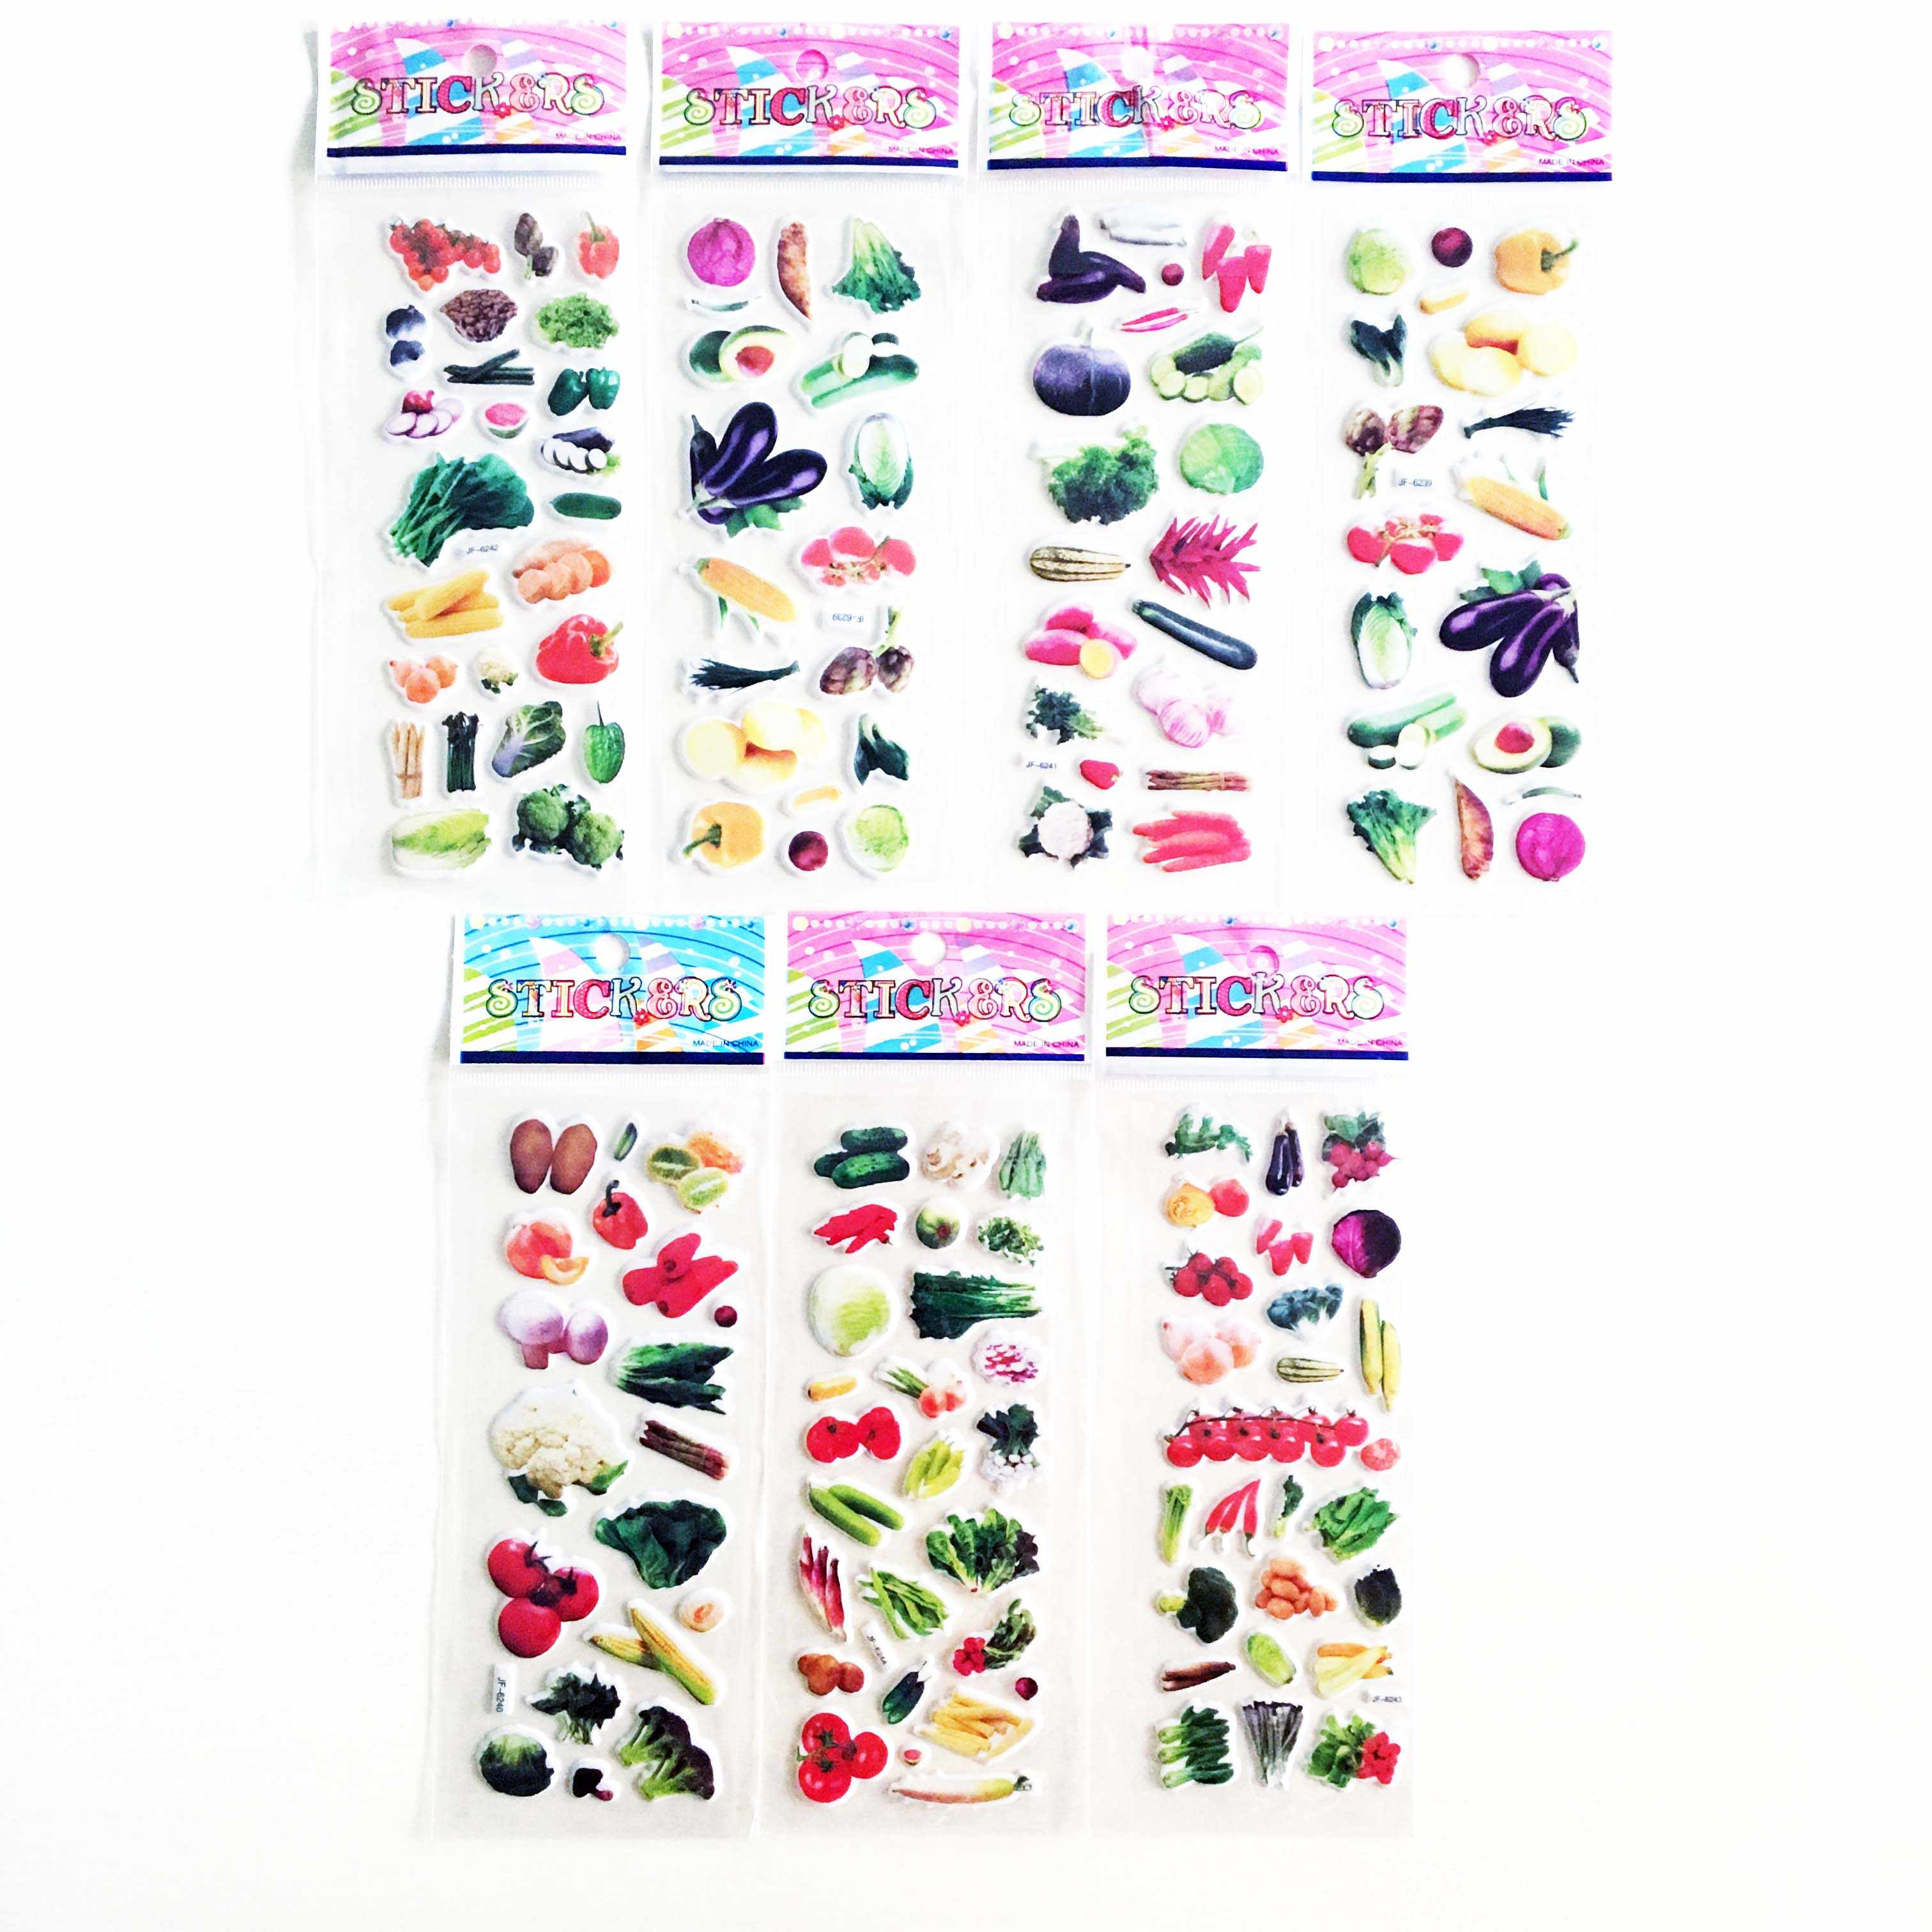 6 uds 3D pegatinas vegetales pegatinas niños niñas chicos PVC pegatinas burbujas pegatinas juguete para niños regalo DIY